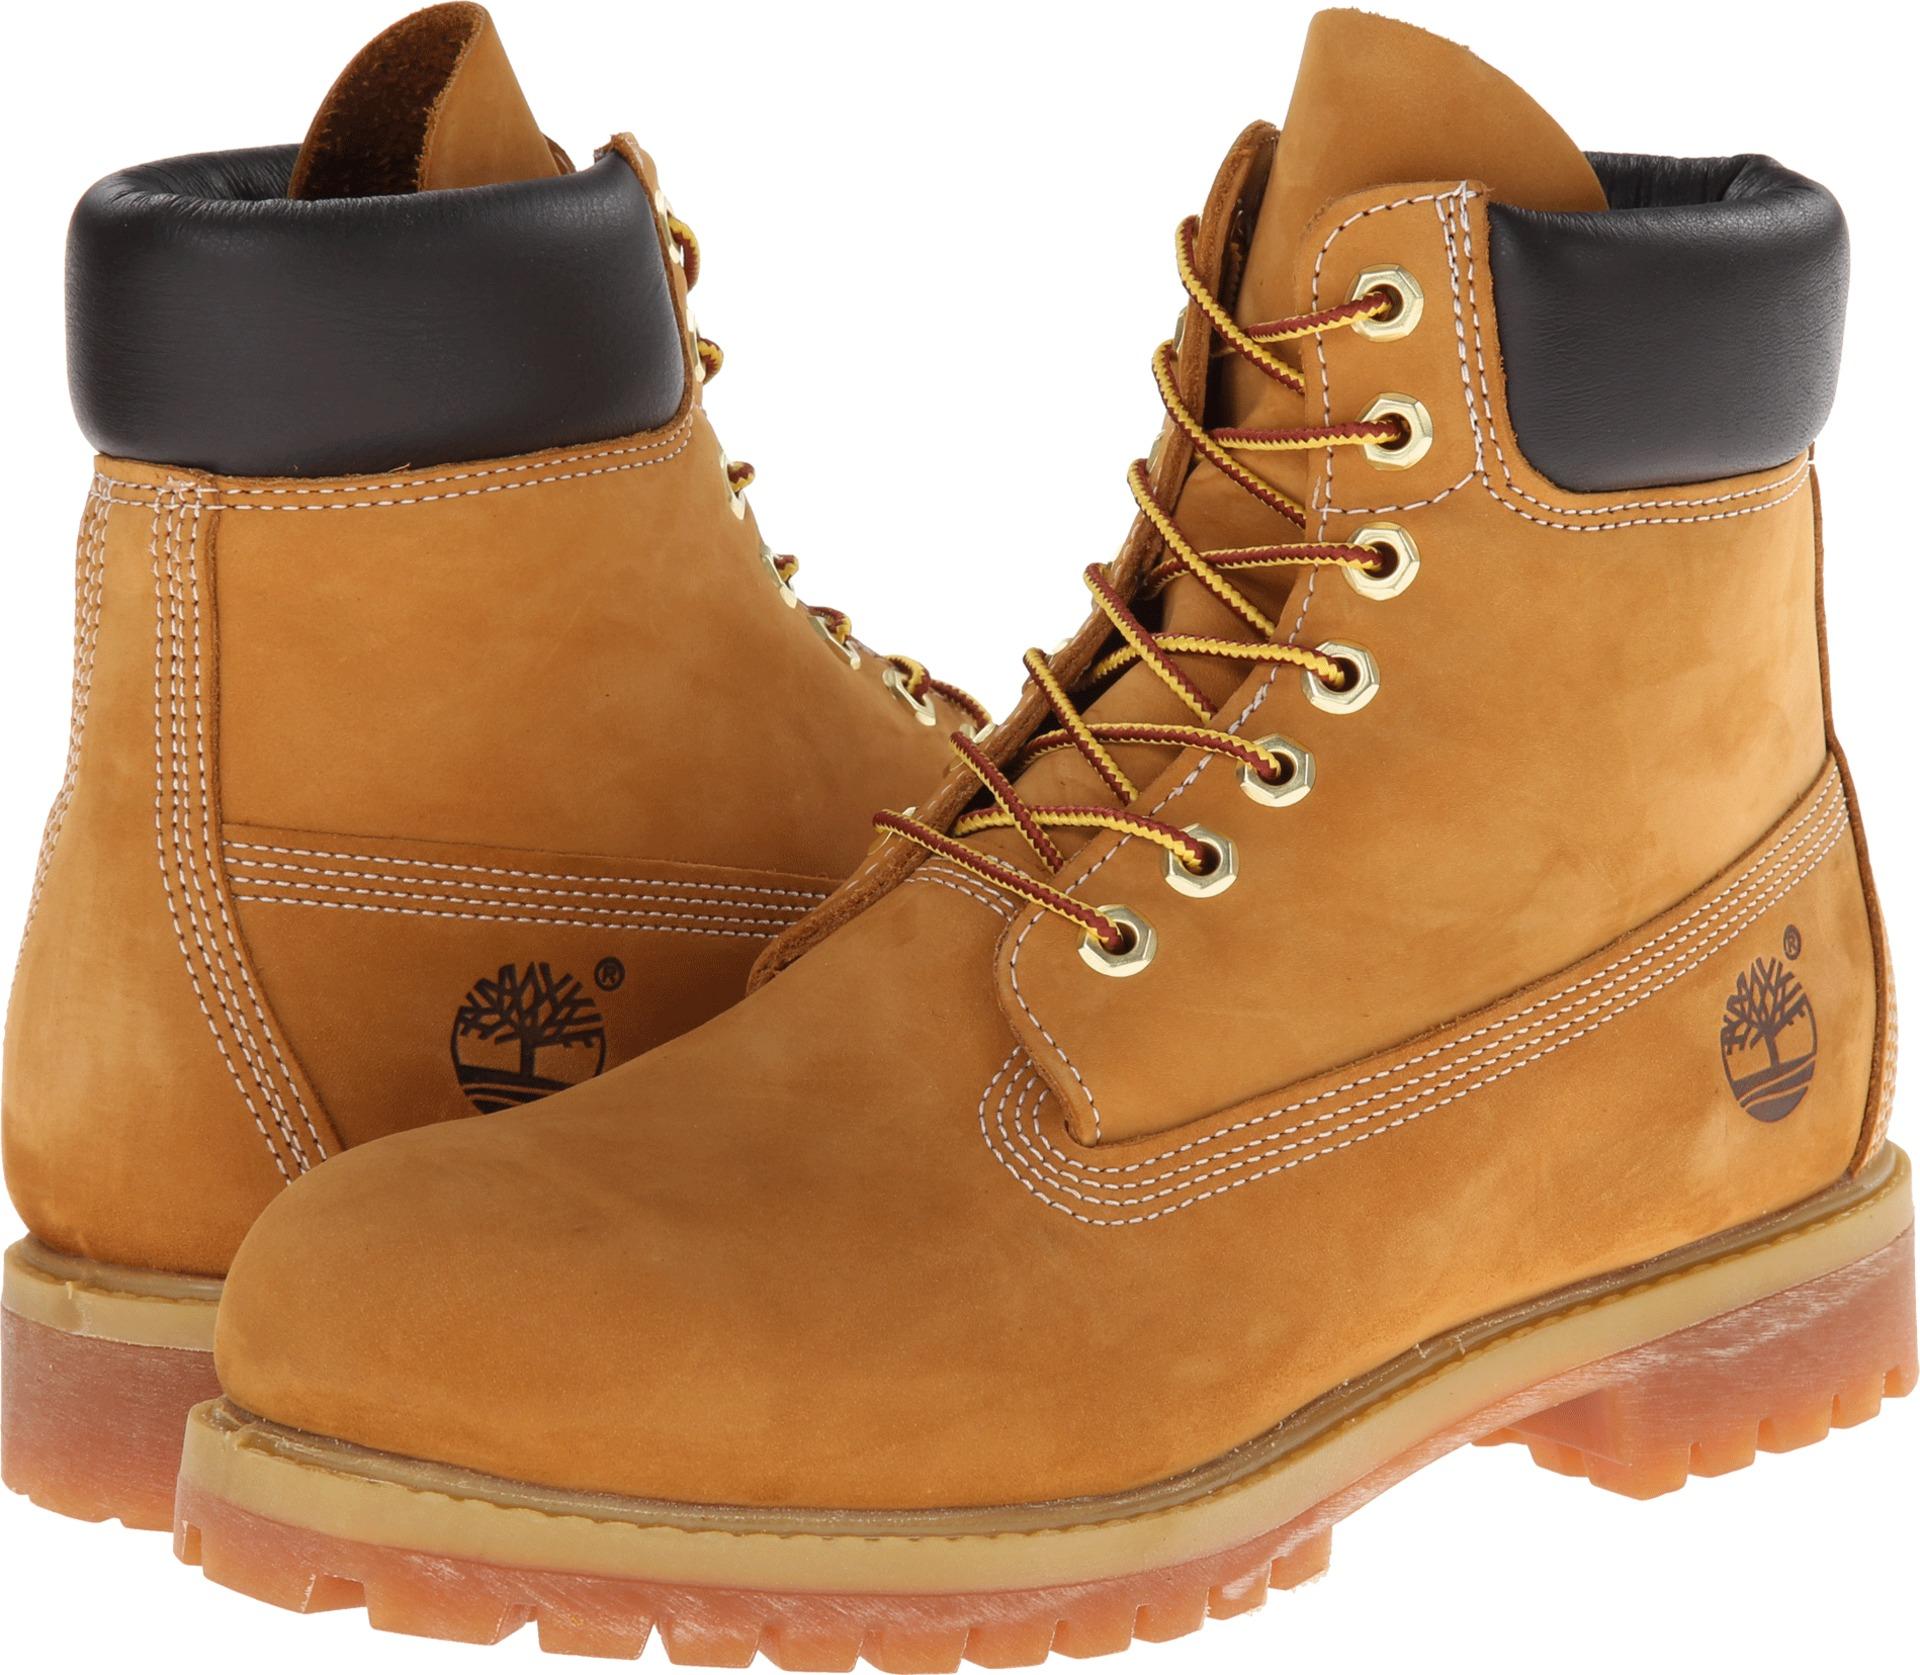 Timberland Classic 6 Quot Premium Boot Wheat Nubuck Leather